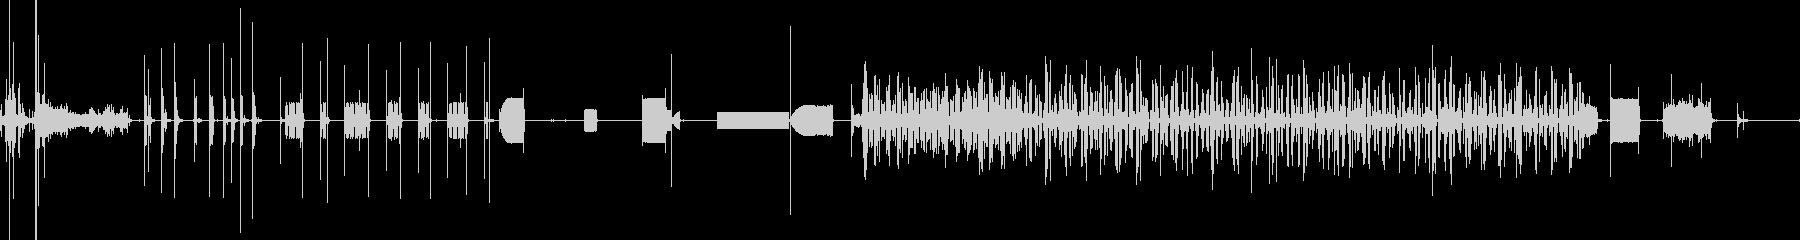 FAXマシン、送信、オフィス; D...の未再生の波形